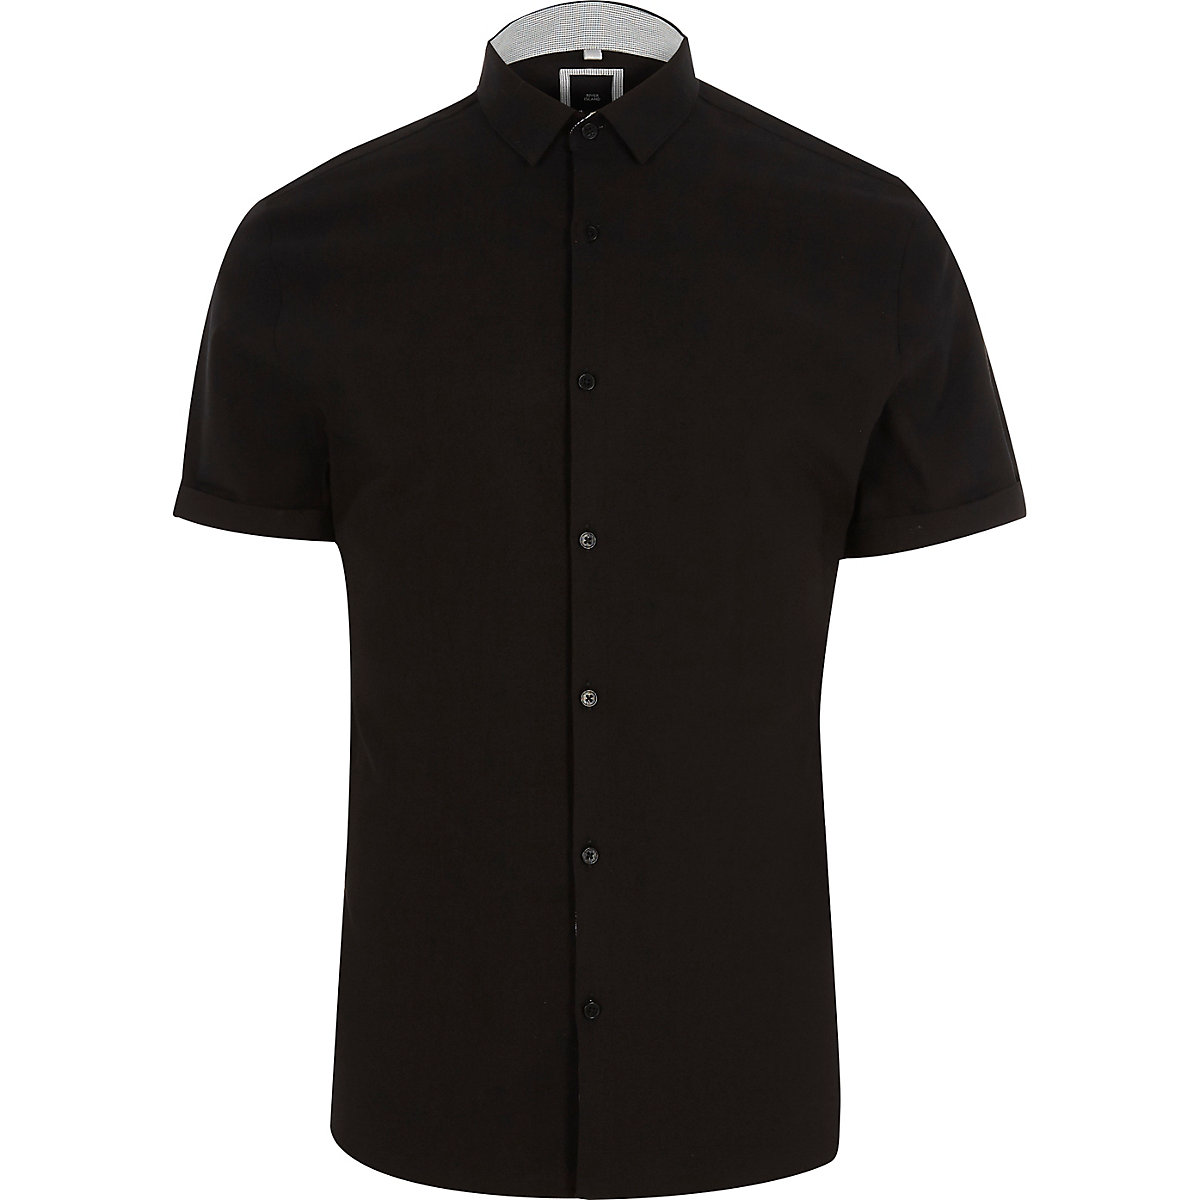 Black smart muscle fit short sleeve shirt